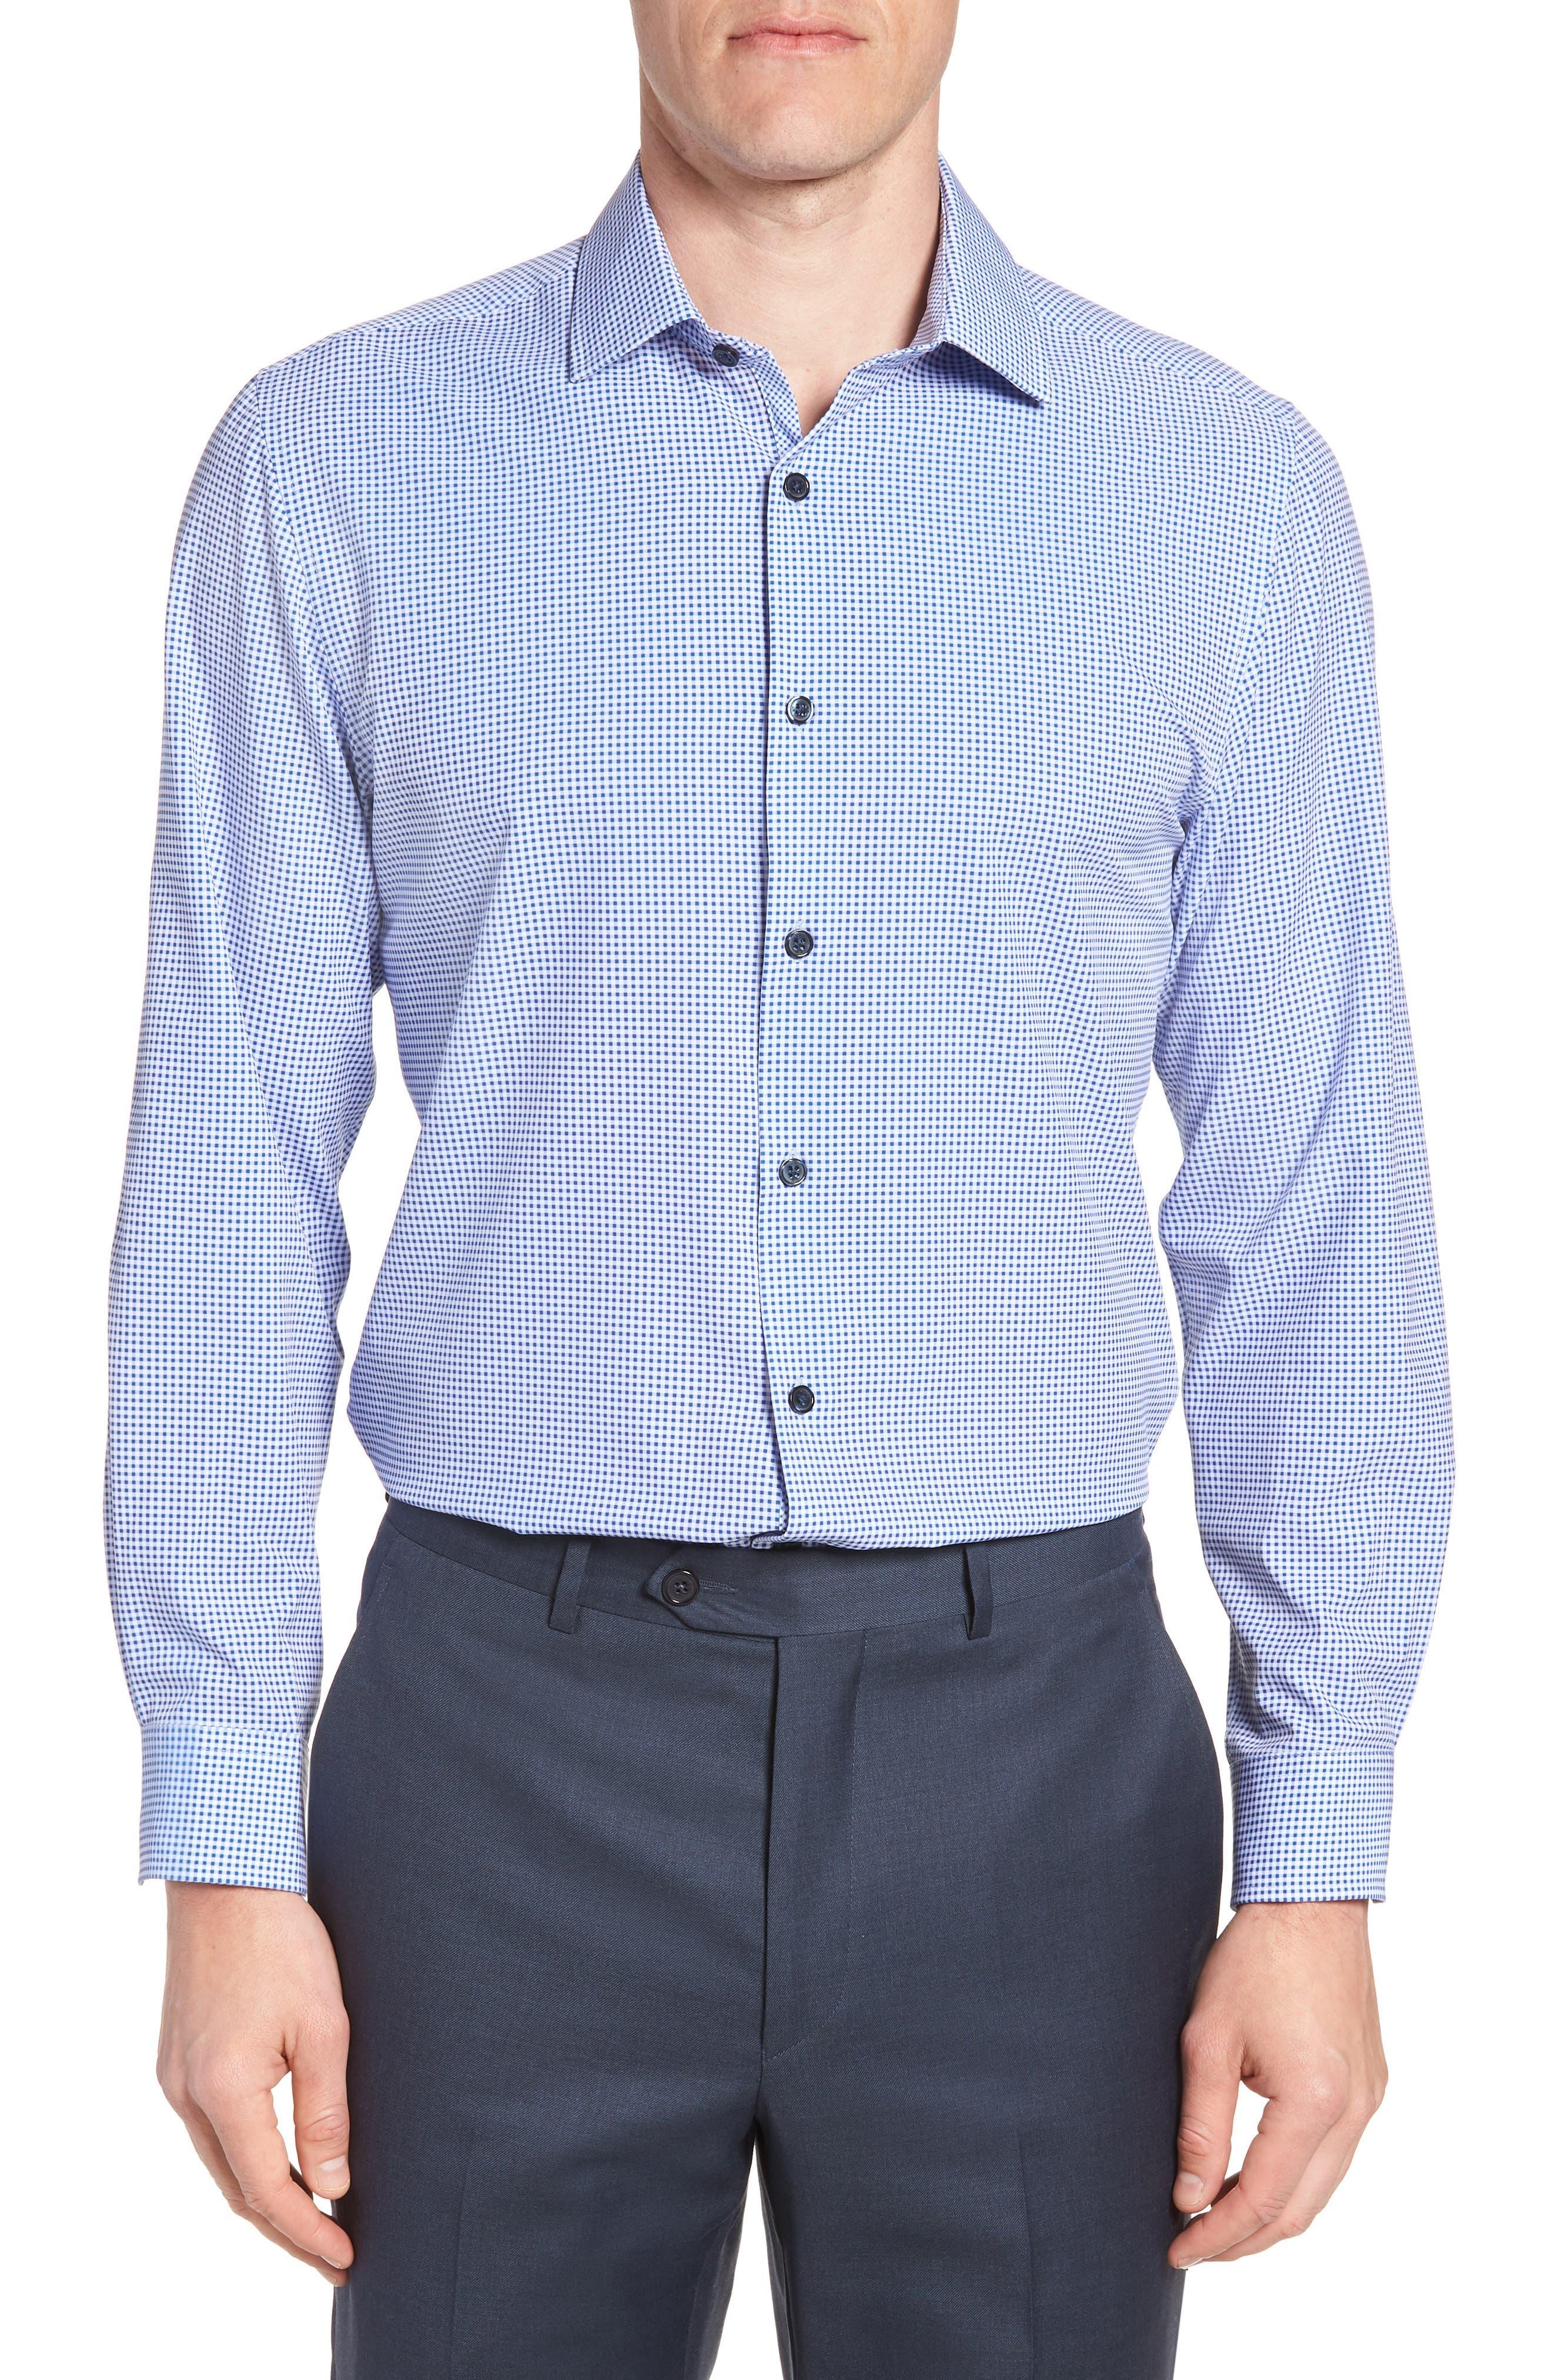 Trim Fit Check 4-Way Stretch Dress Shirt,                             Main thumbnail 1, color,                             LILAC